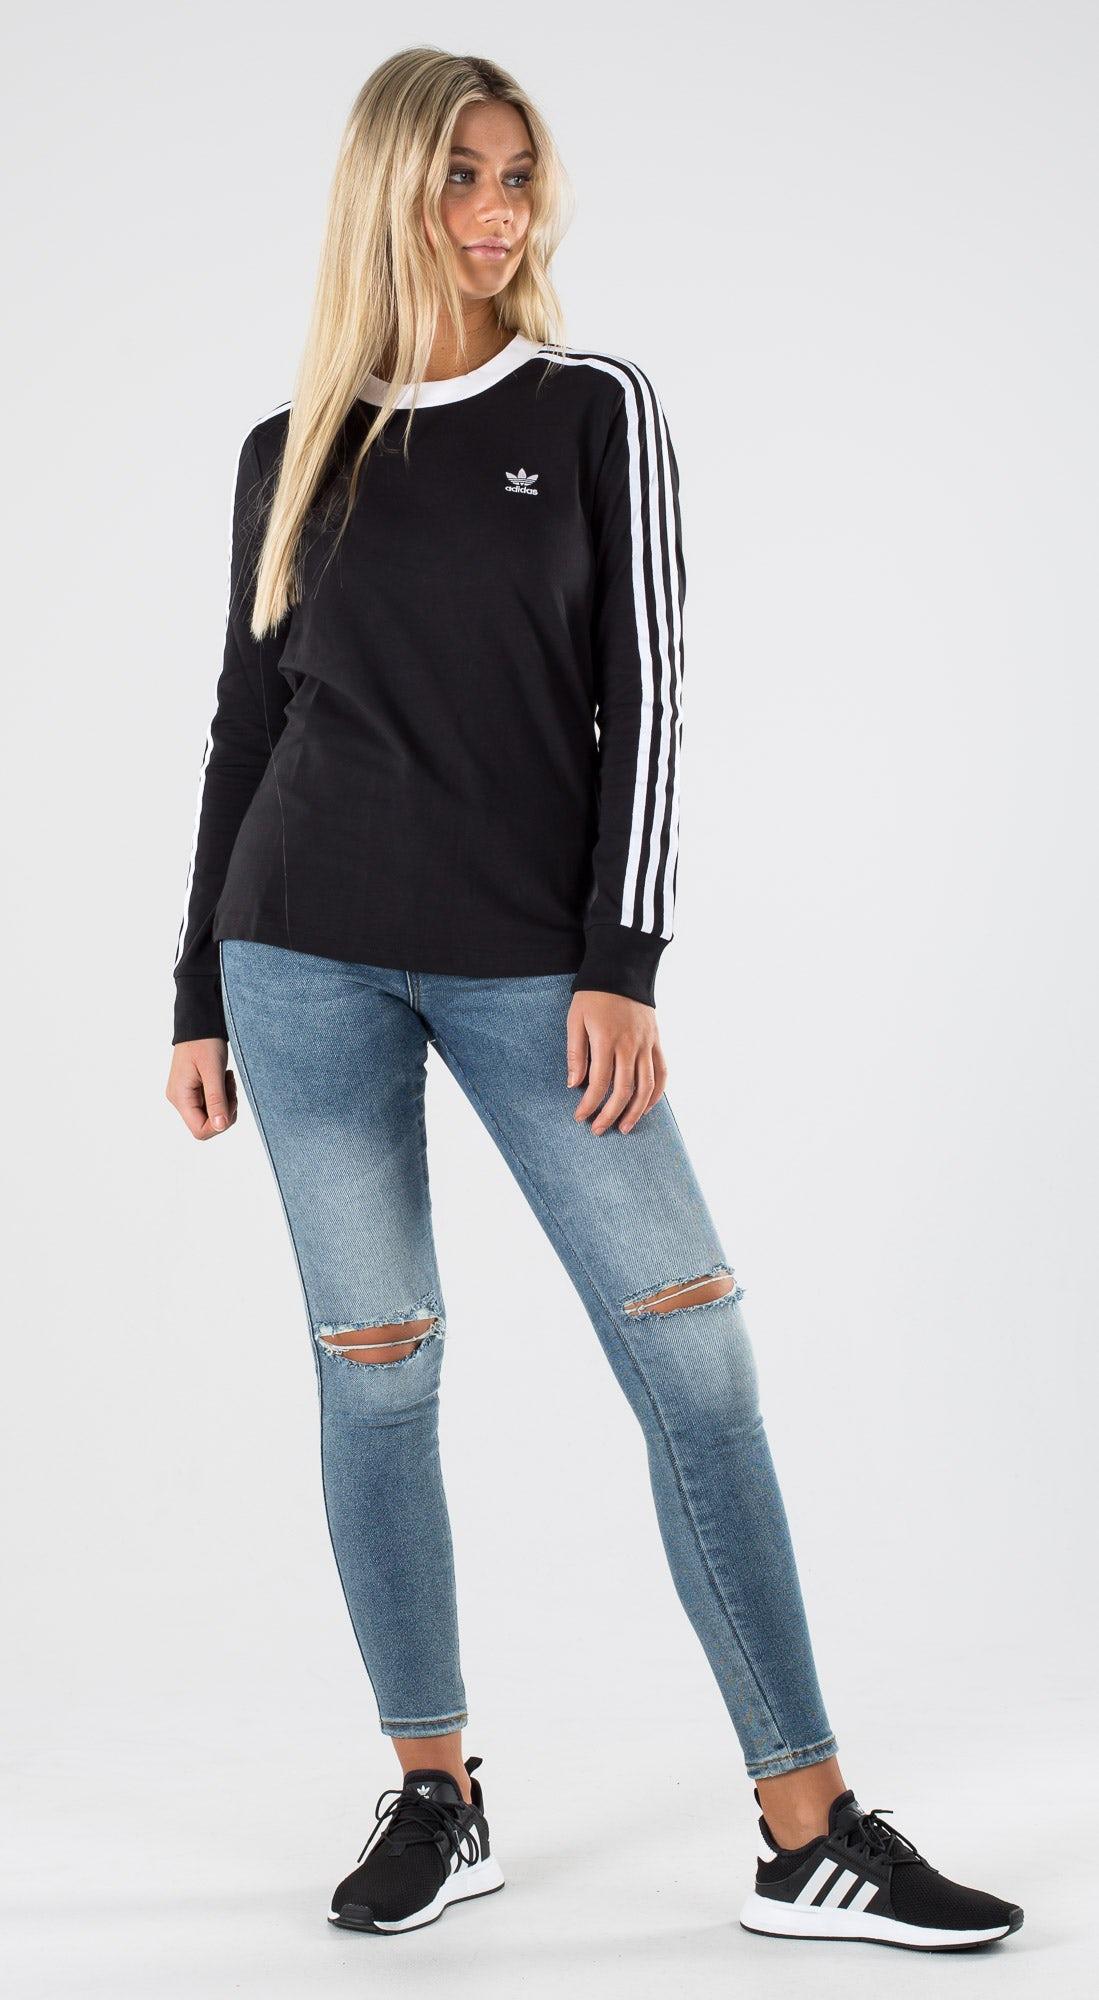 Adidas Originals 3 Stripe Longsleeve Black White